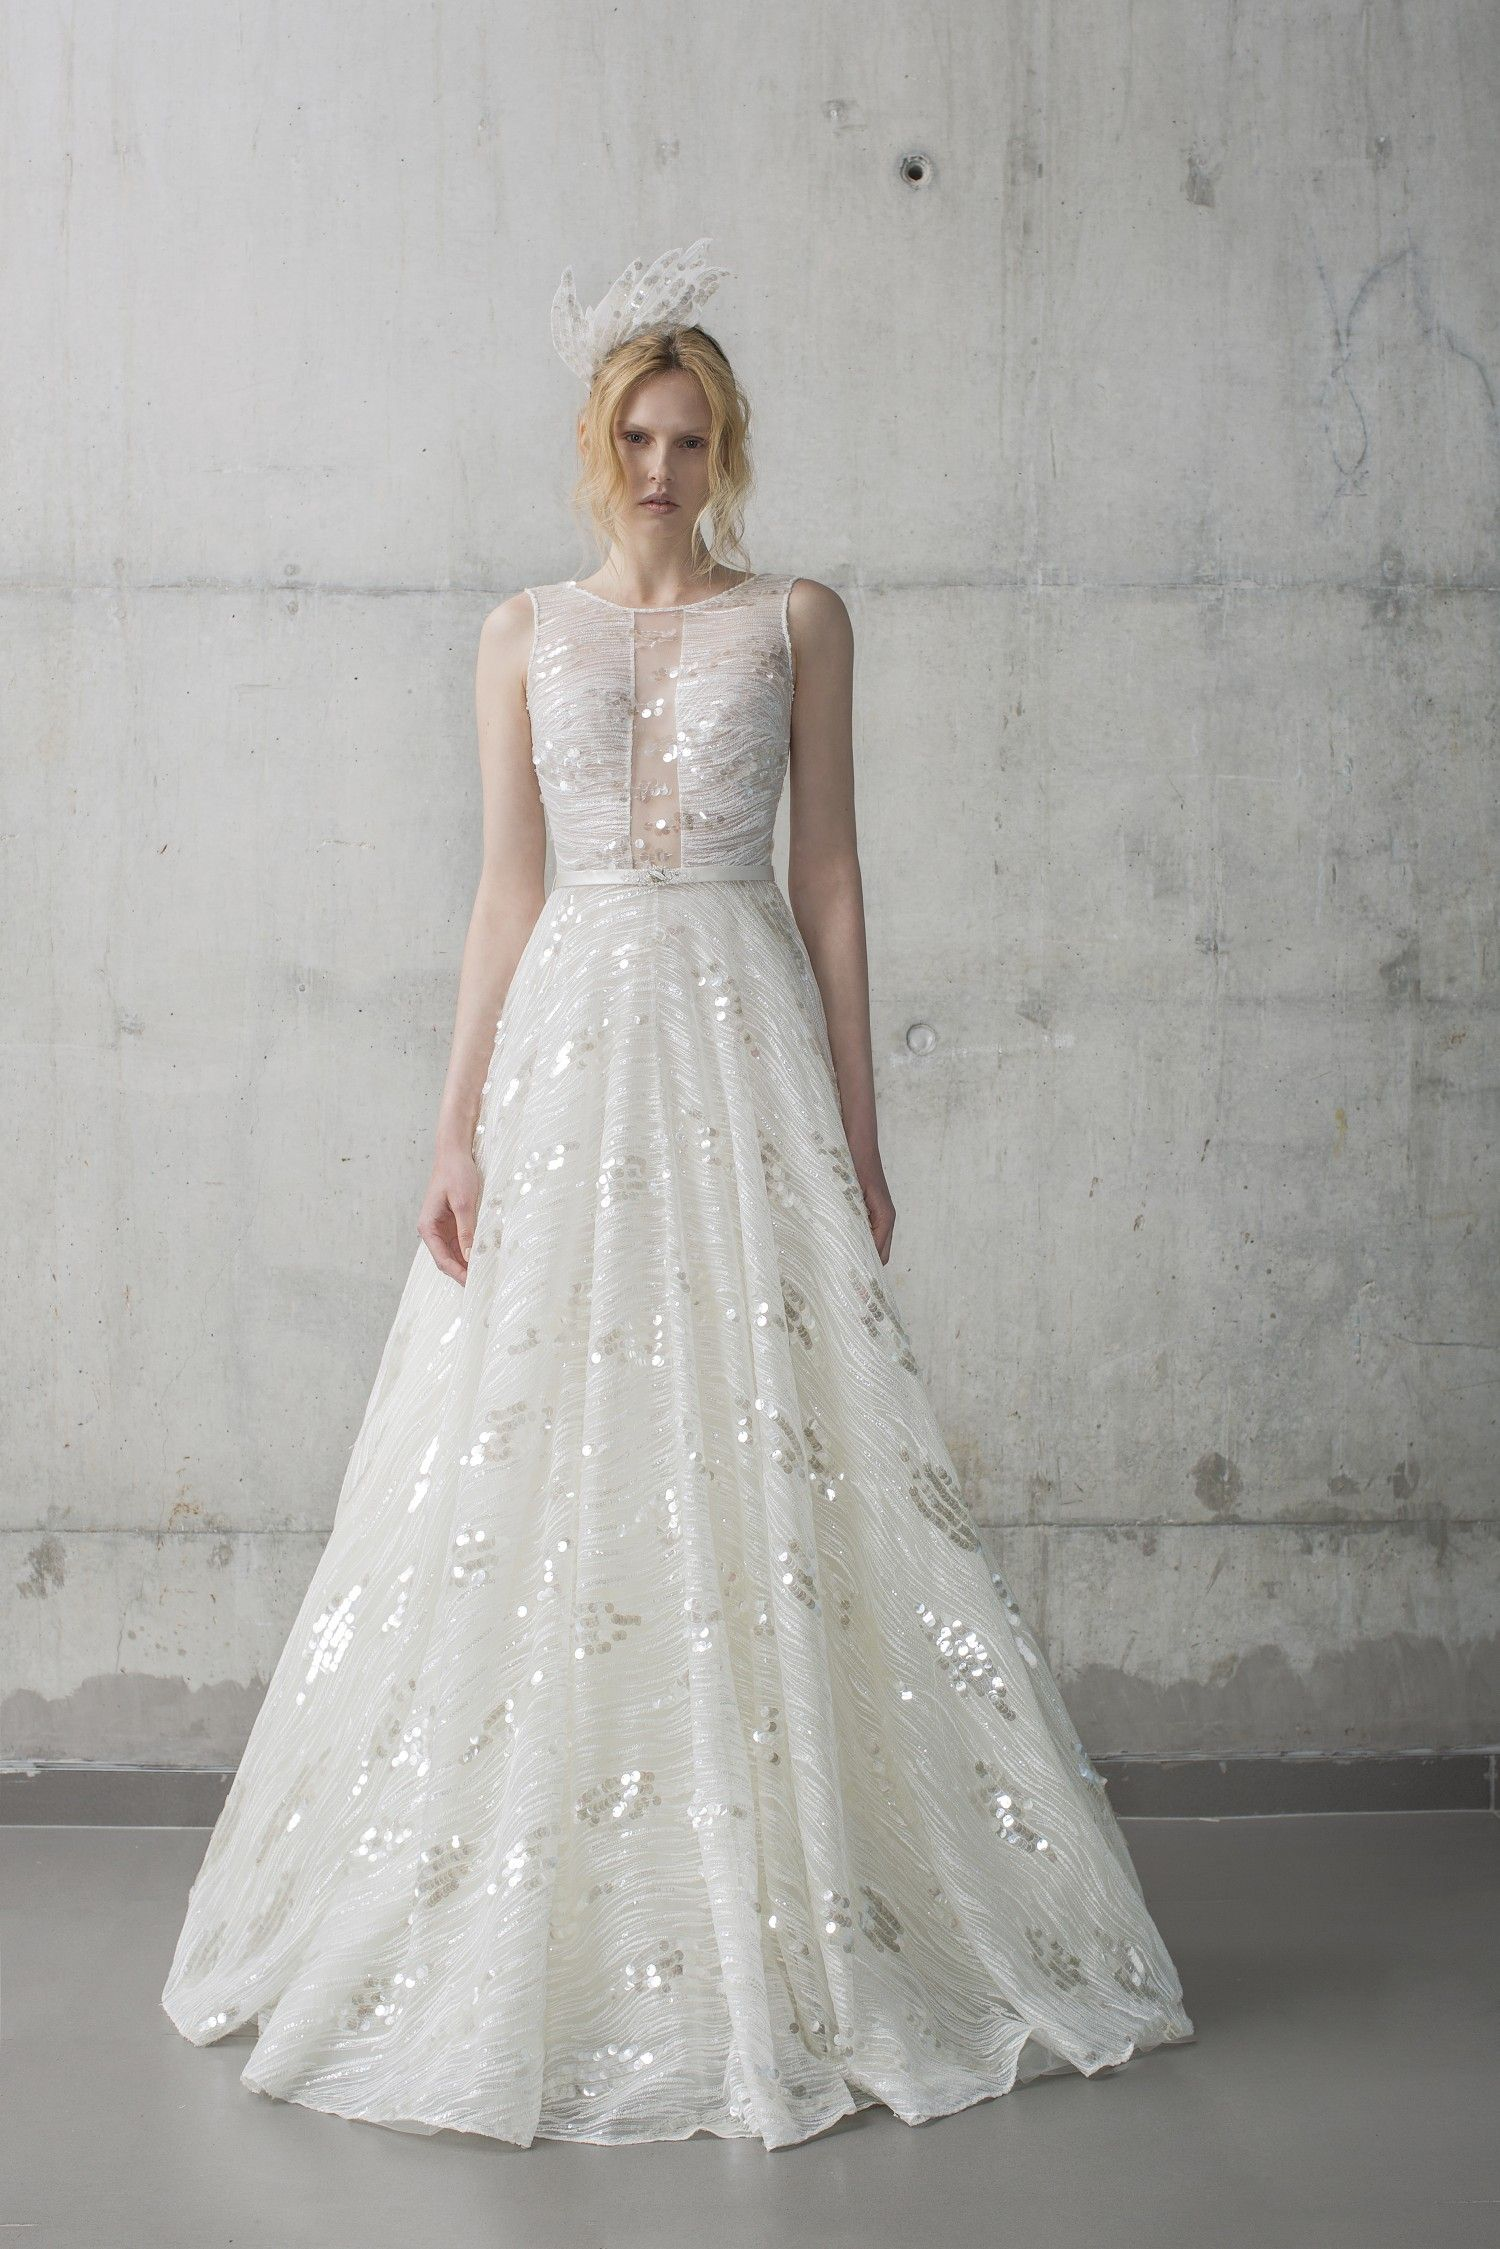 Pin by Susan Mitchell Blavin on Alli wedding dress (With